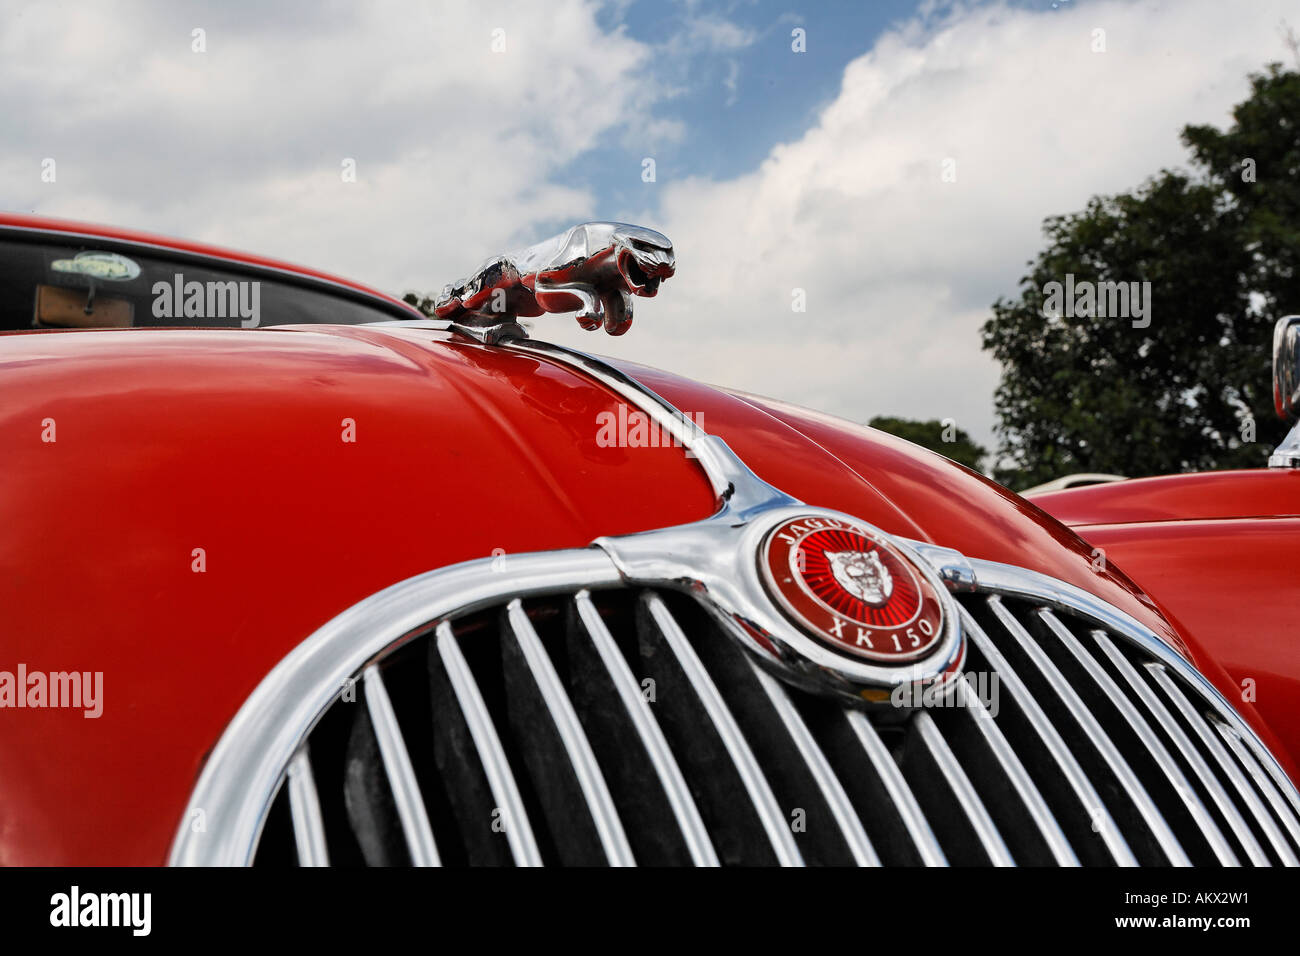 Jaguar XK 150, vintage display, Cheshire, England - Stock Image